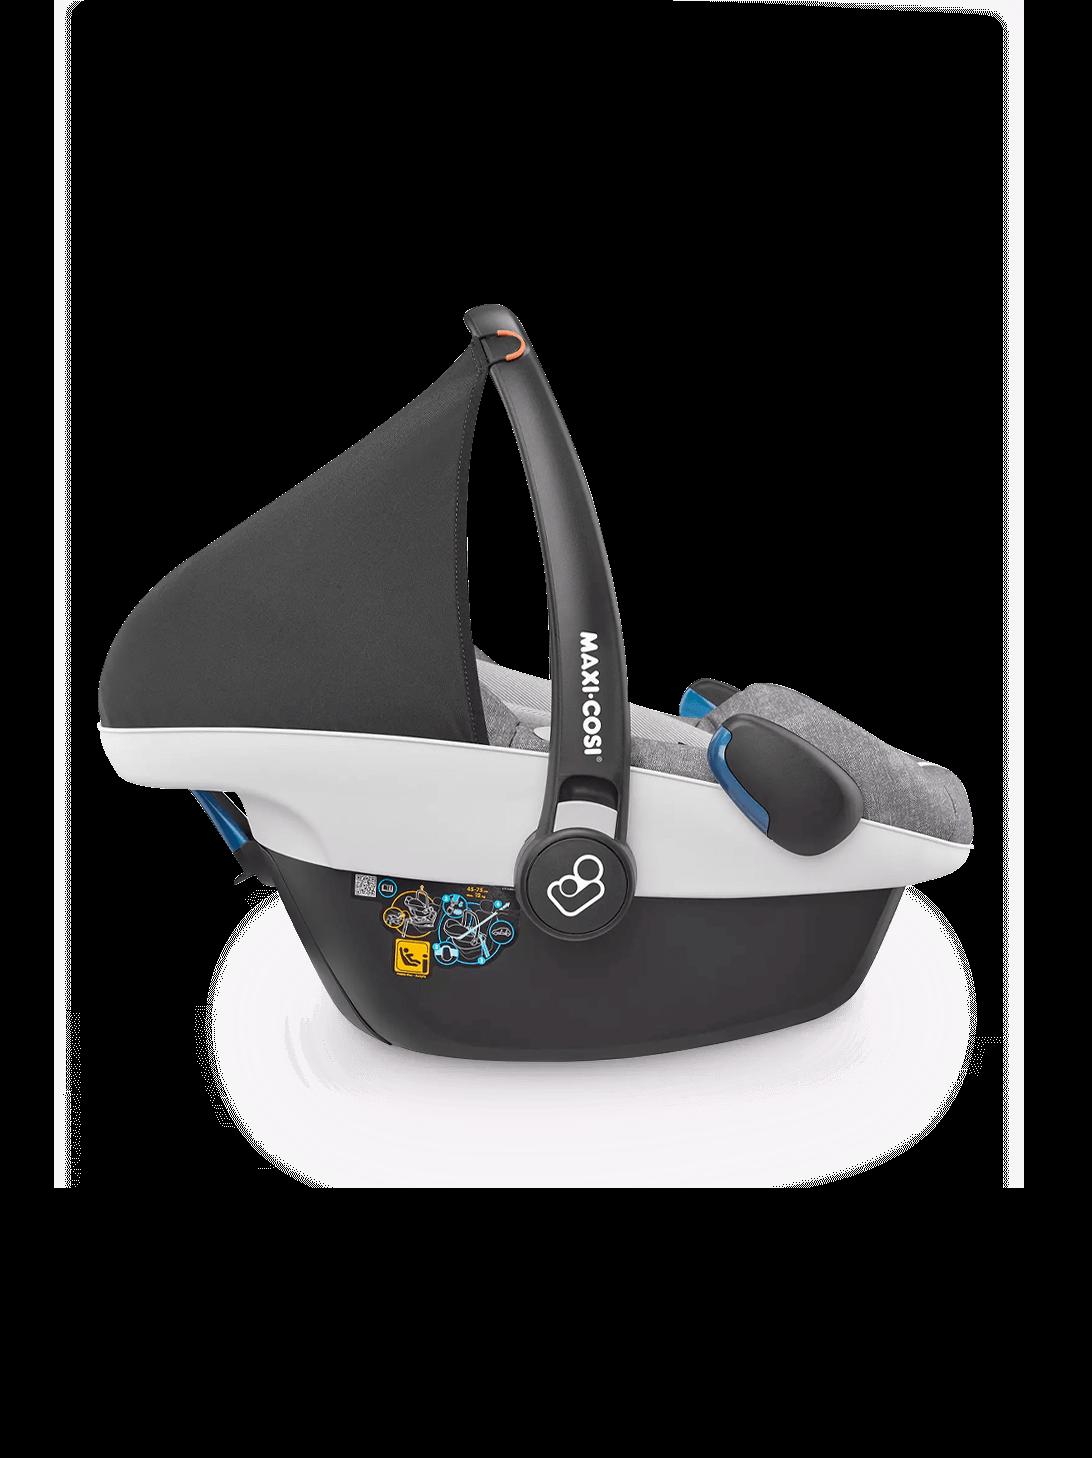 Maxi-Cosi Pebble Pro